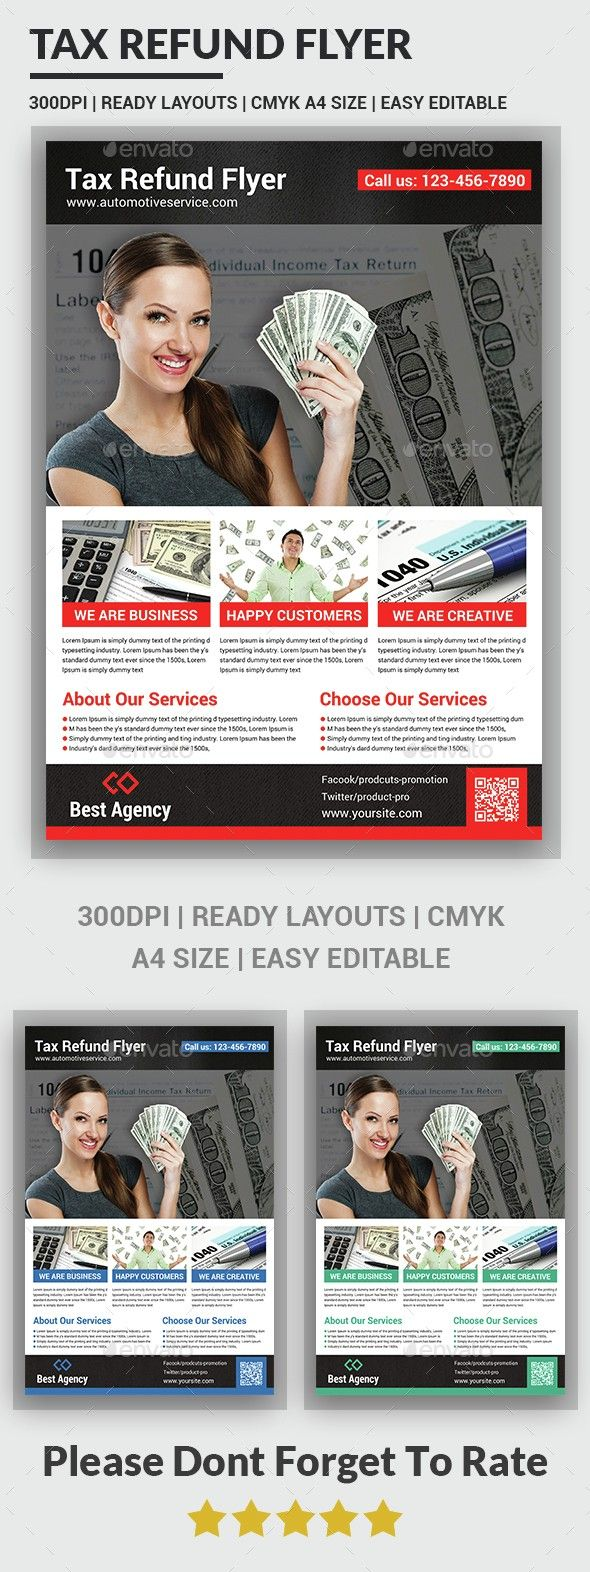 Tax Refund Flyer Template Pinterest Tax Preparation Template